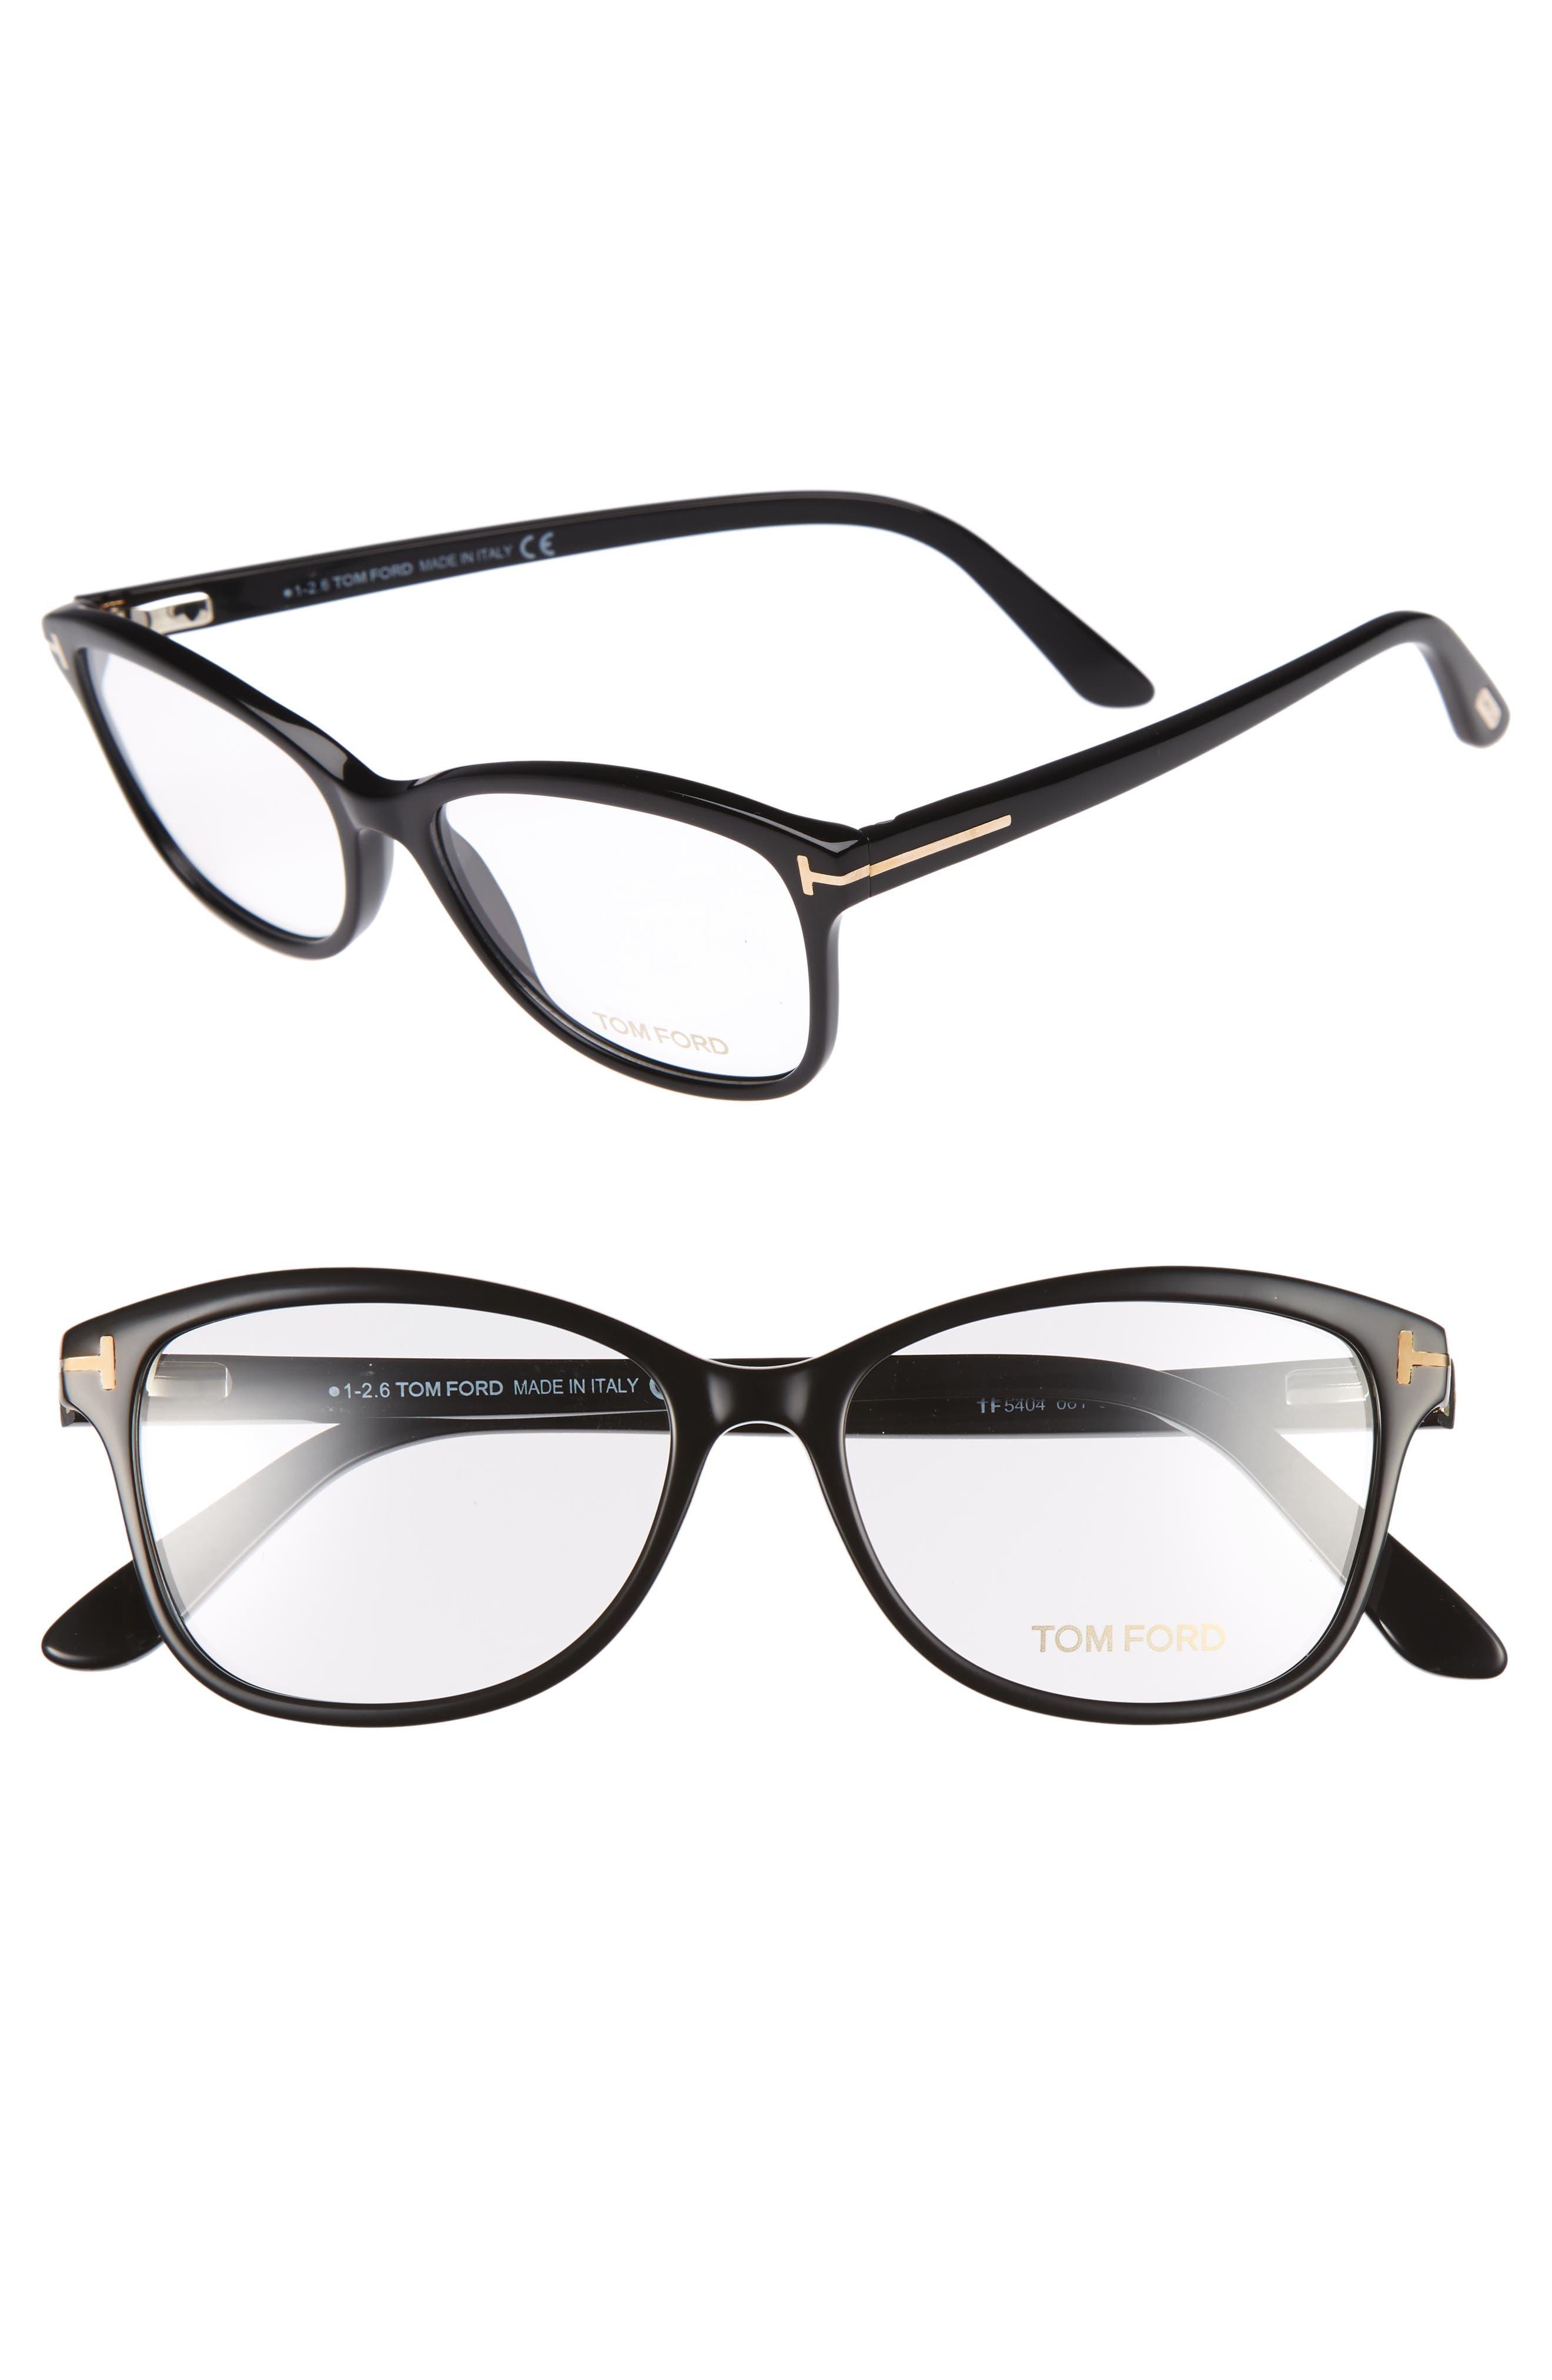 Tom Ford 53mm Optical Glasses